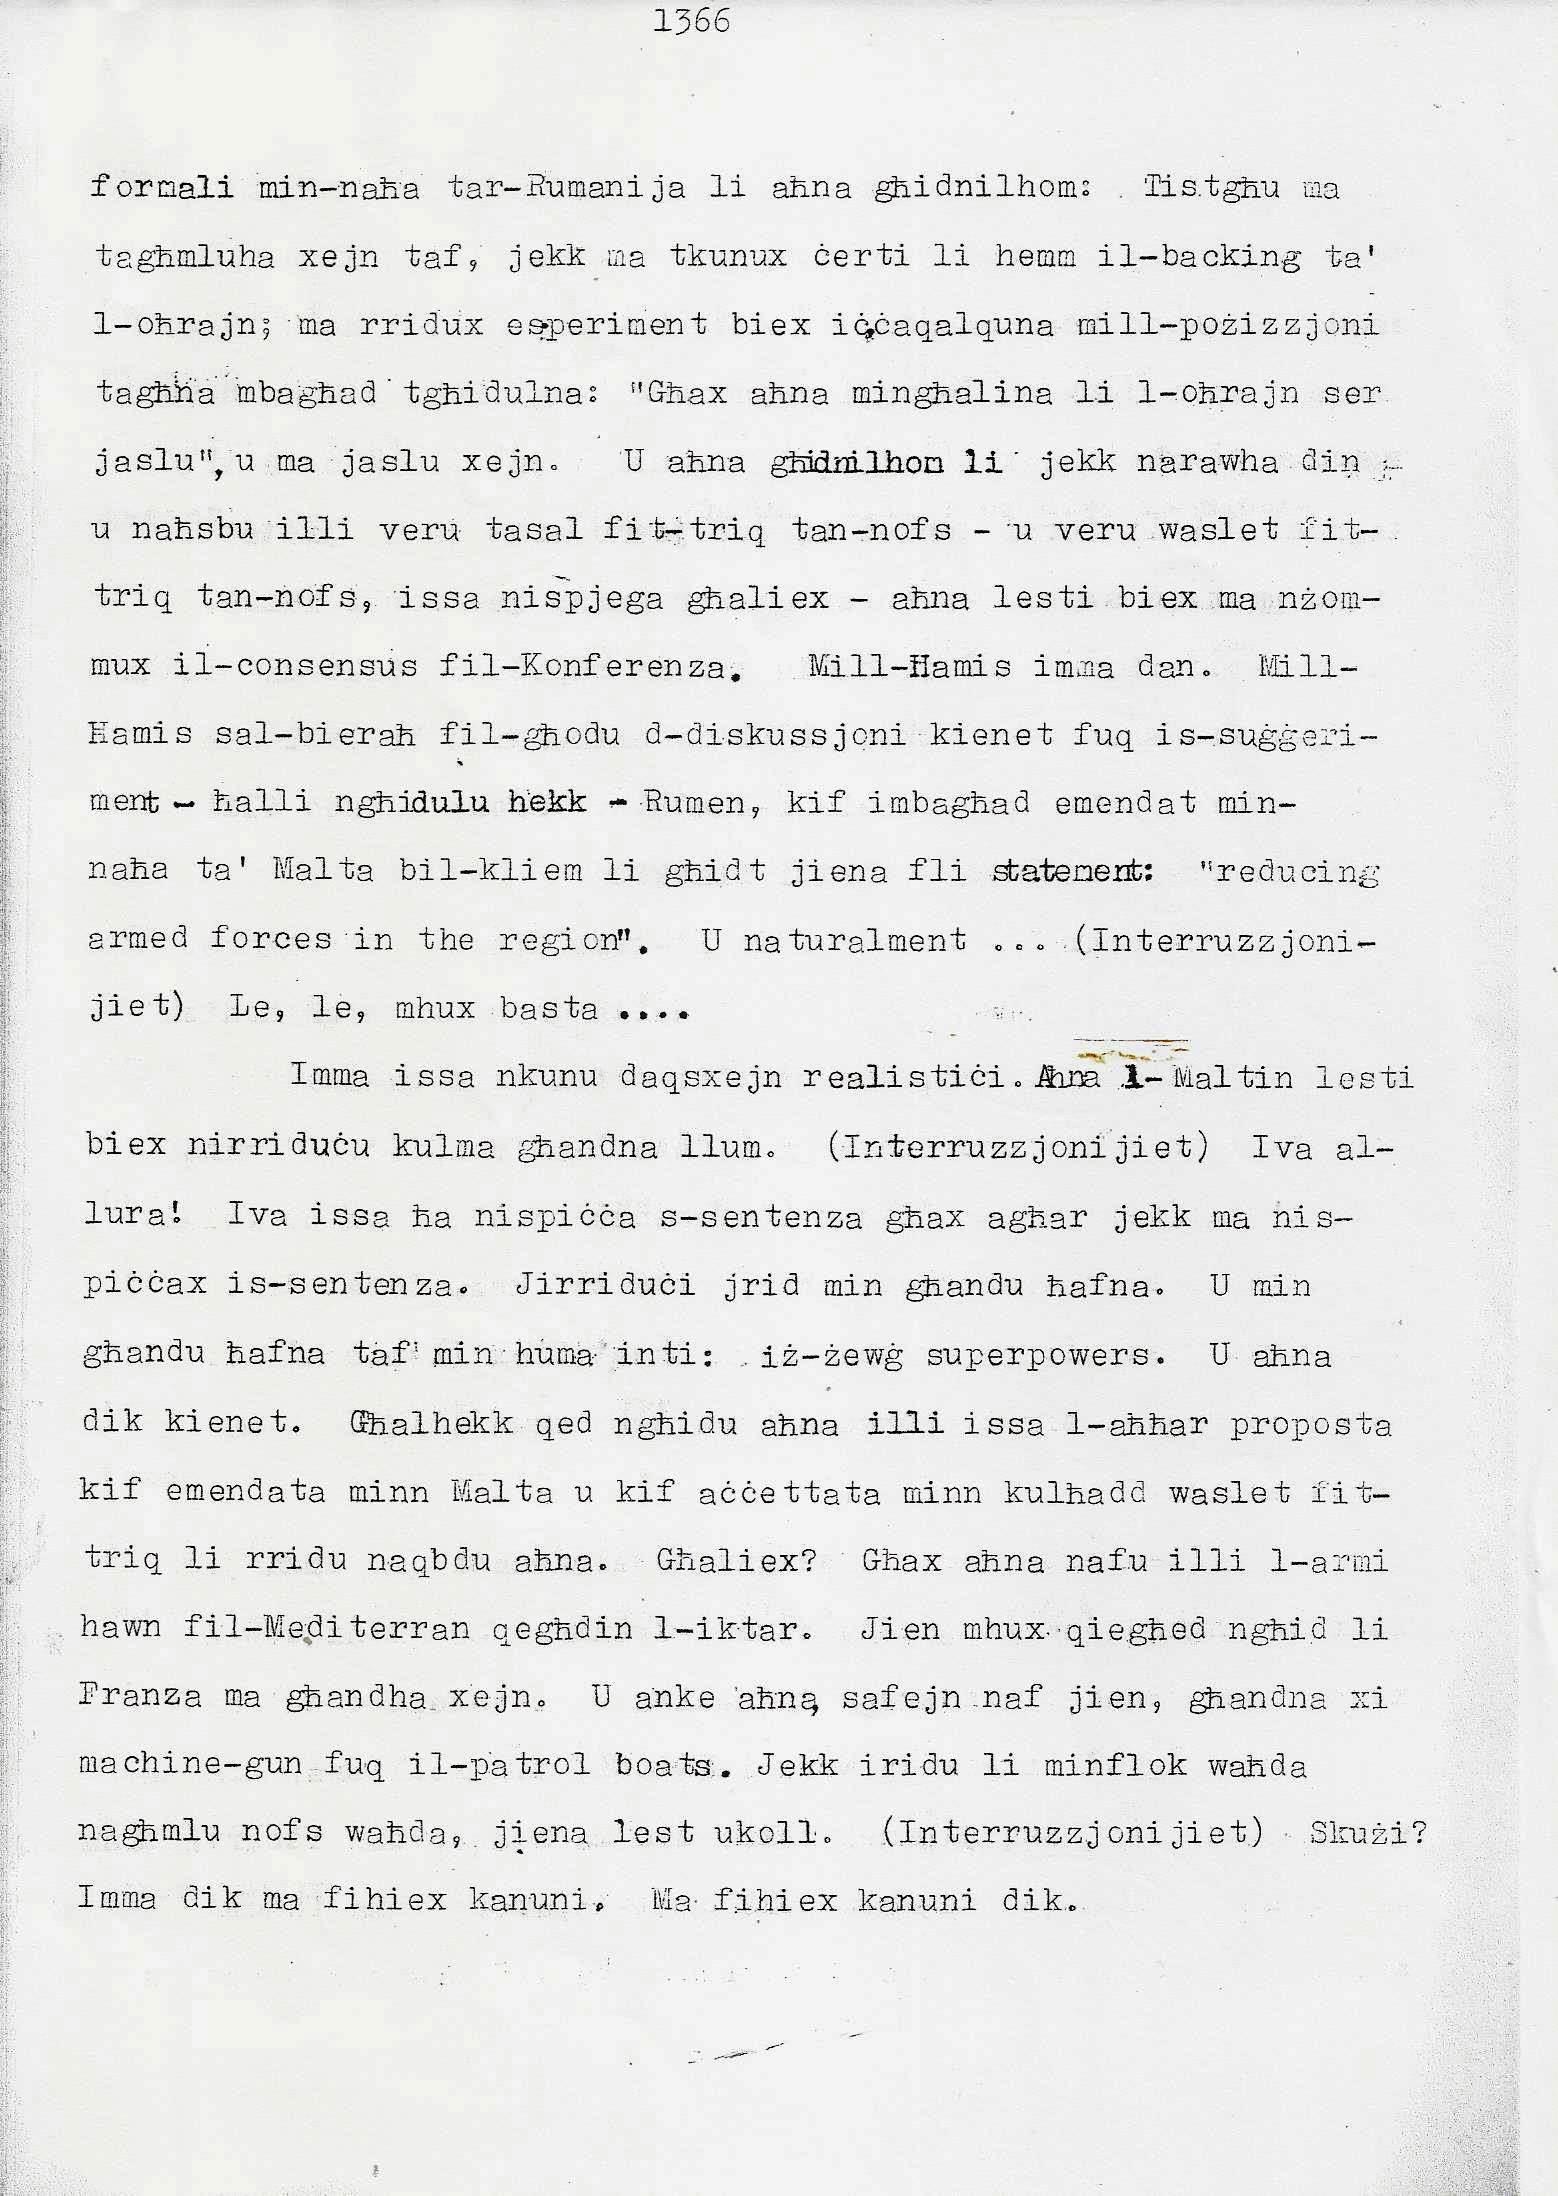 14. Dom Mintoff Parlament 15-7-1975